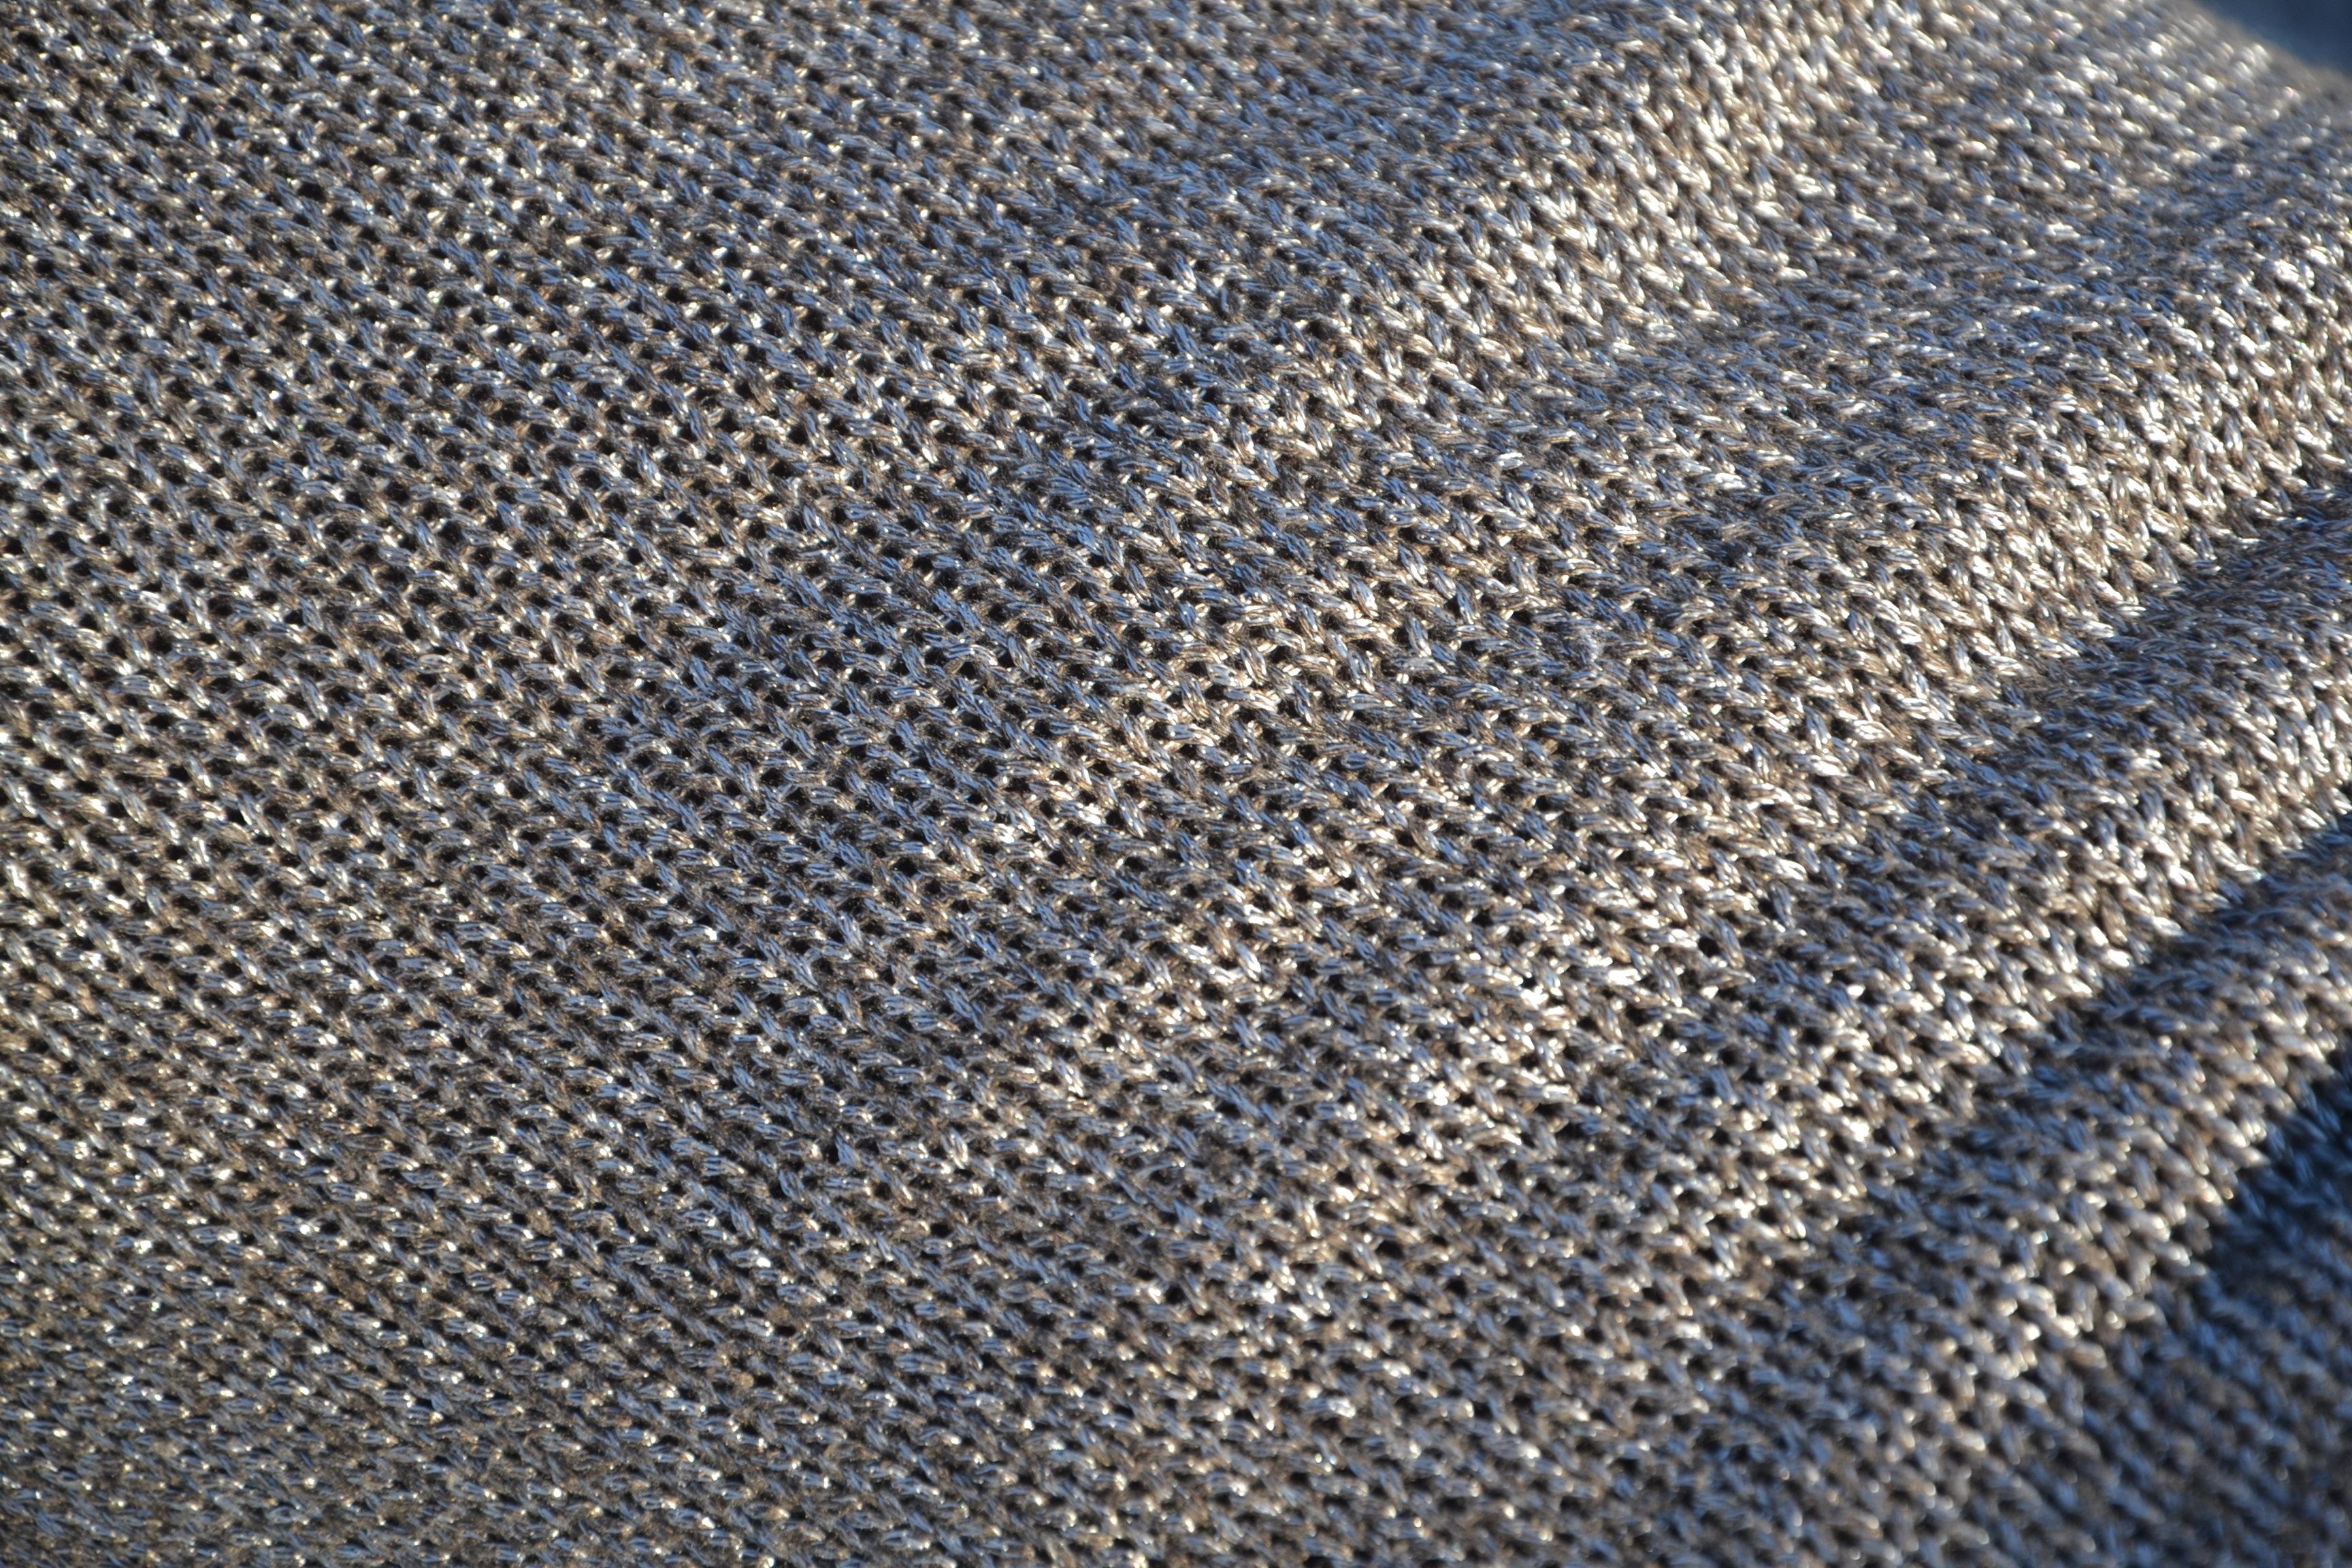 carpet texture pattern. Texture Floor Asphalt Web Pattern Model Wool Material Fabric Textile Design Silver Wallpaper Carpet Cotton Flooring